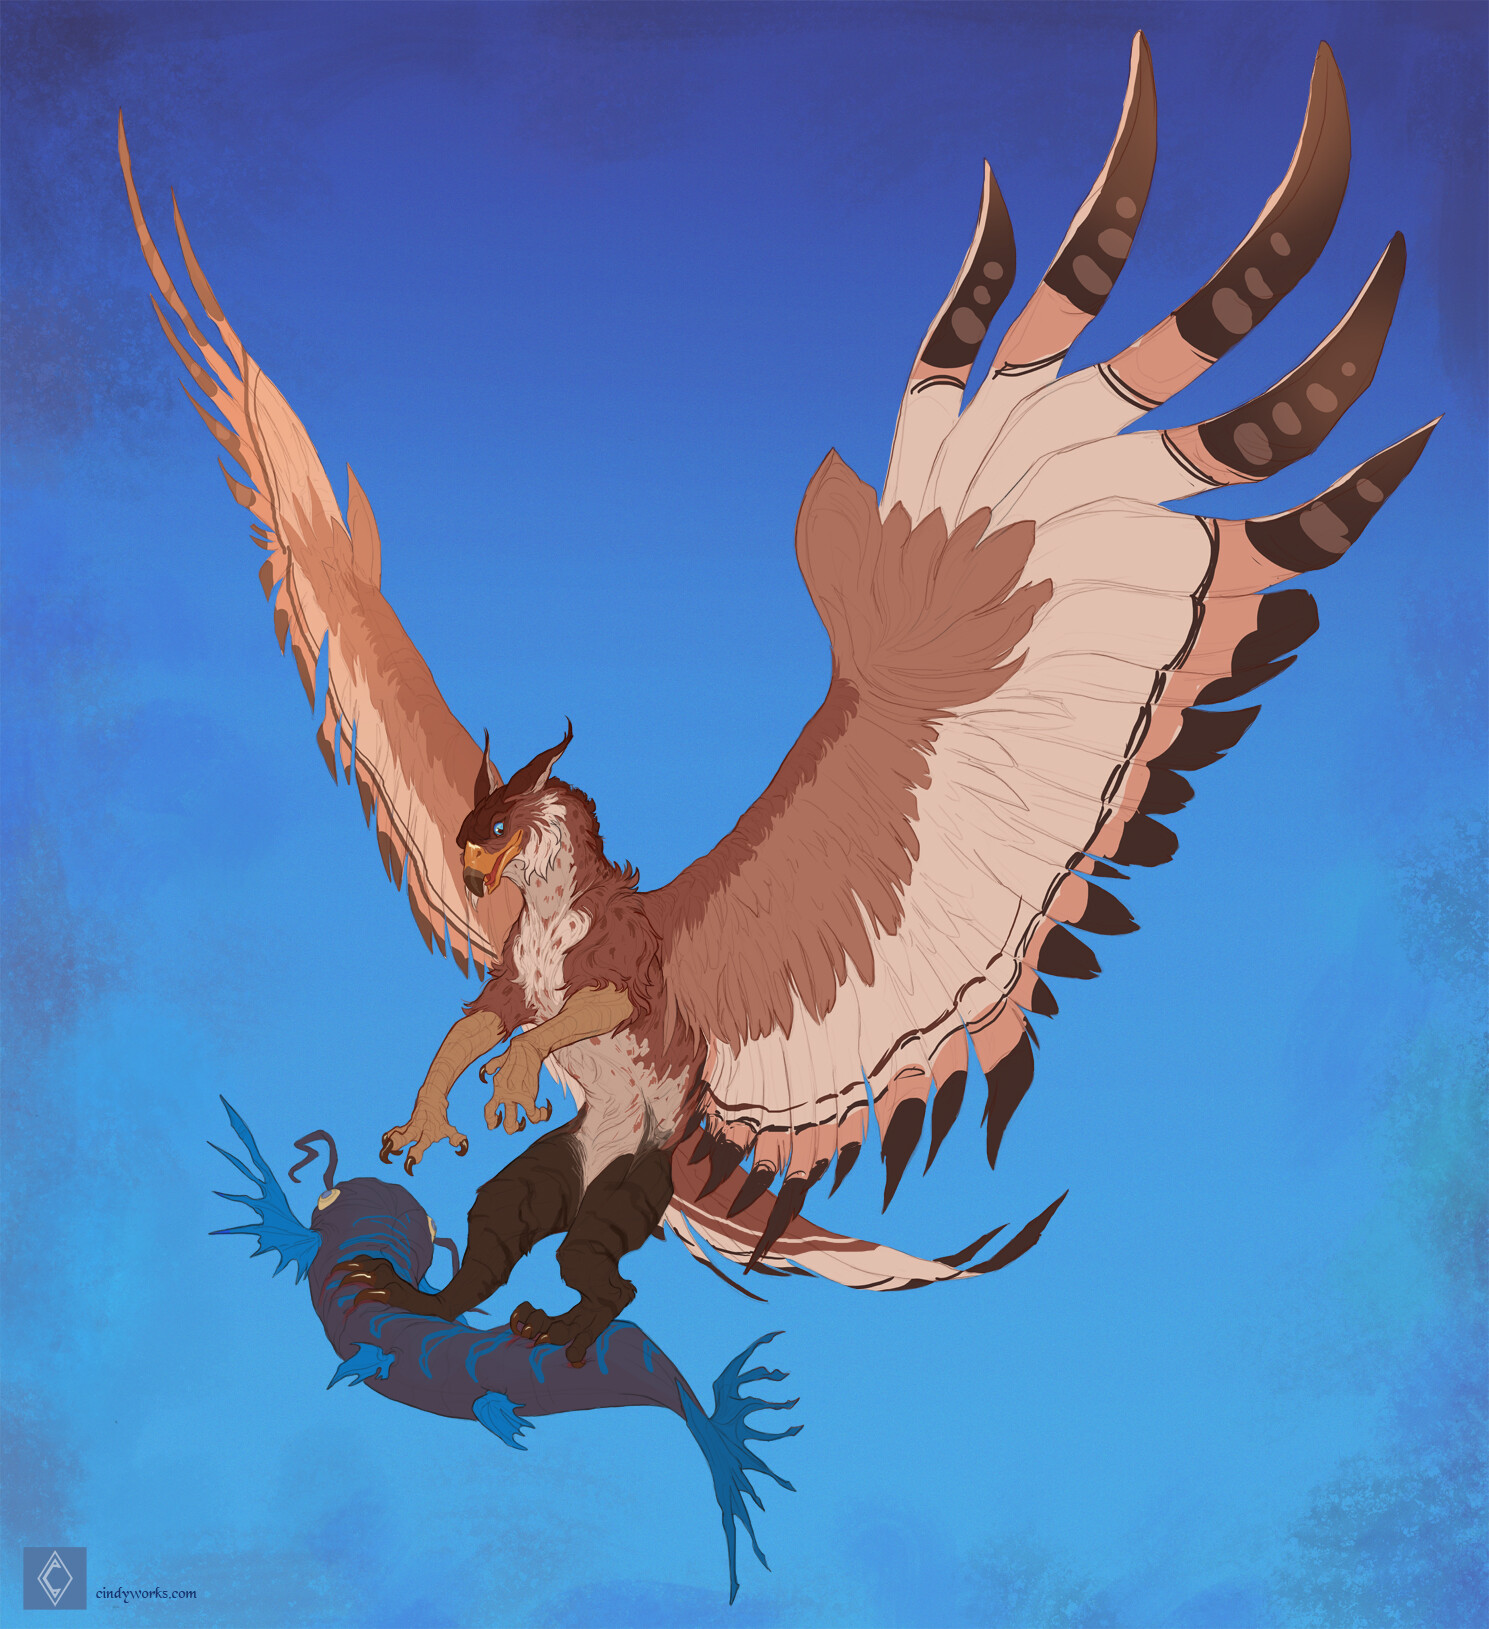 Cindy avelino scottphyrebird character sketch